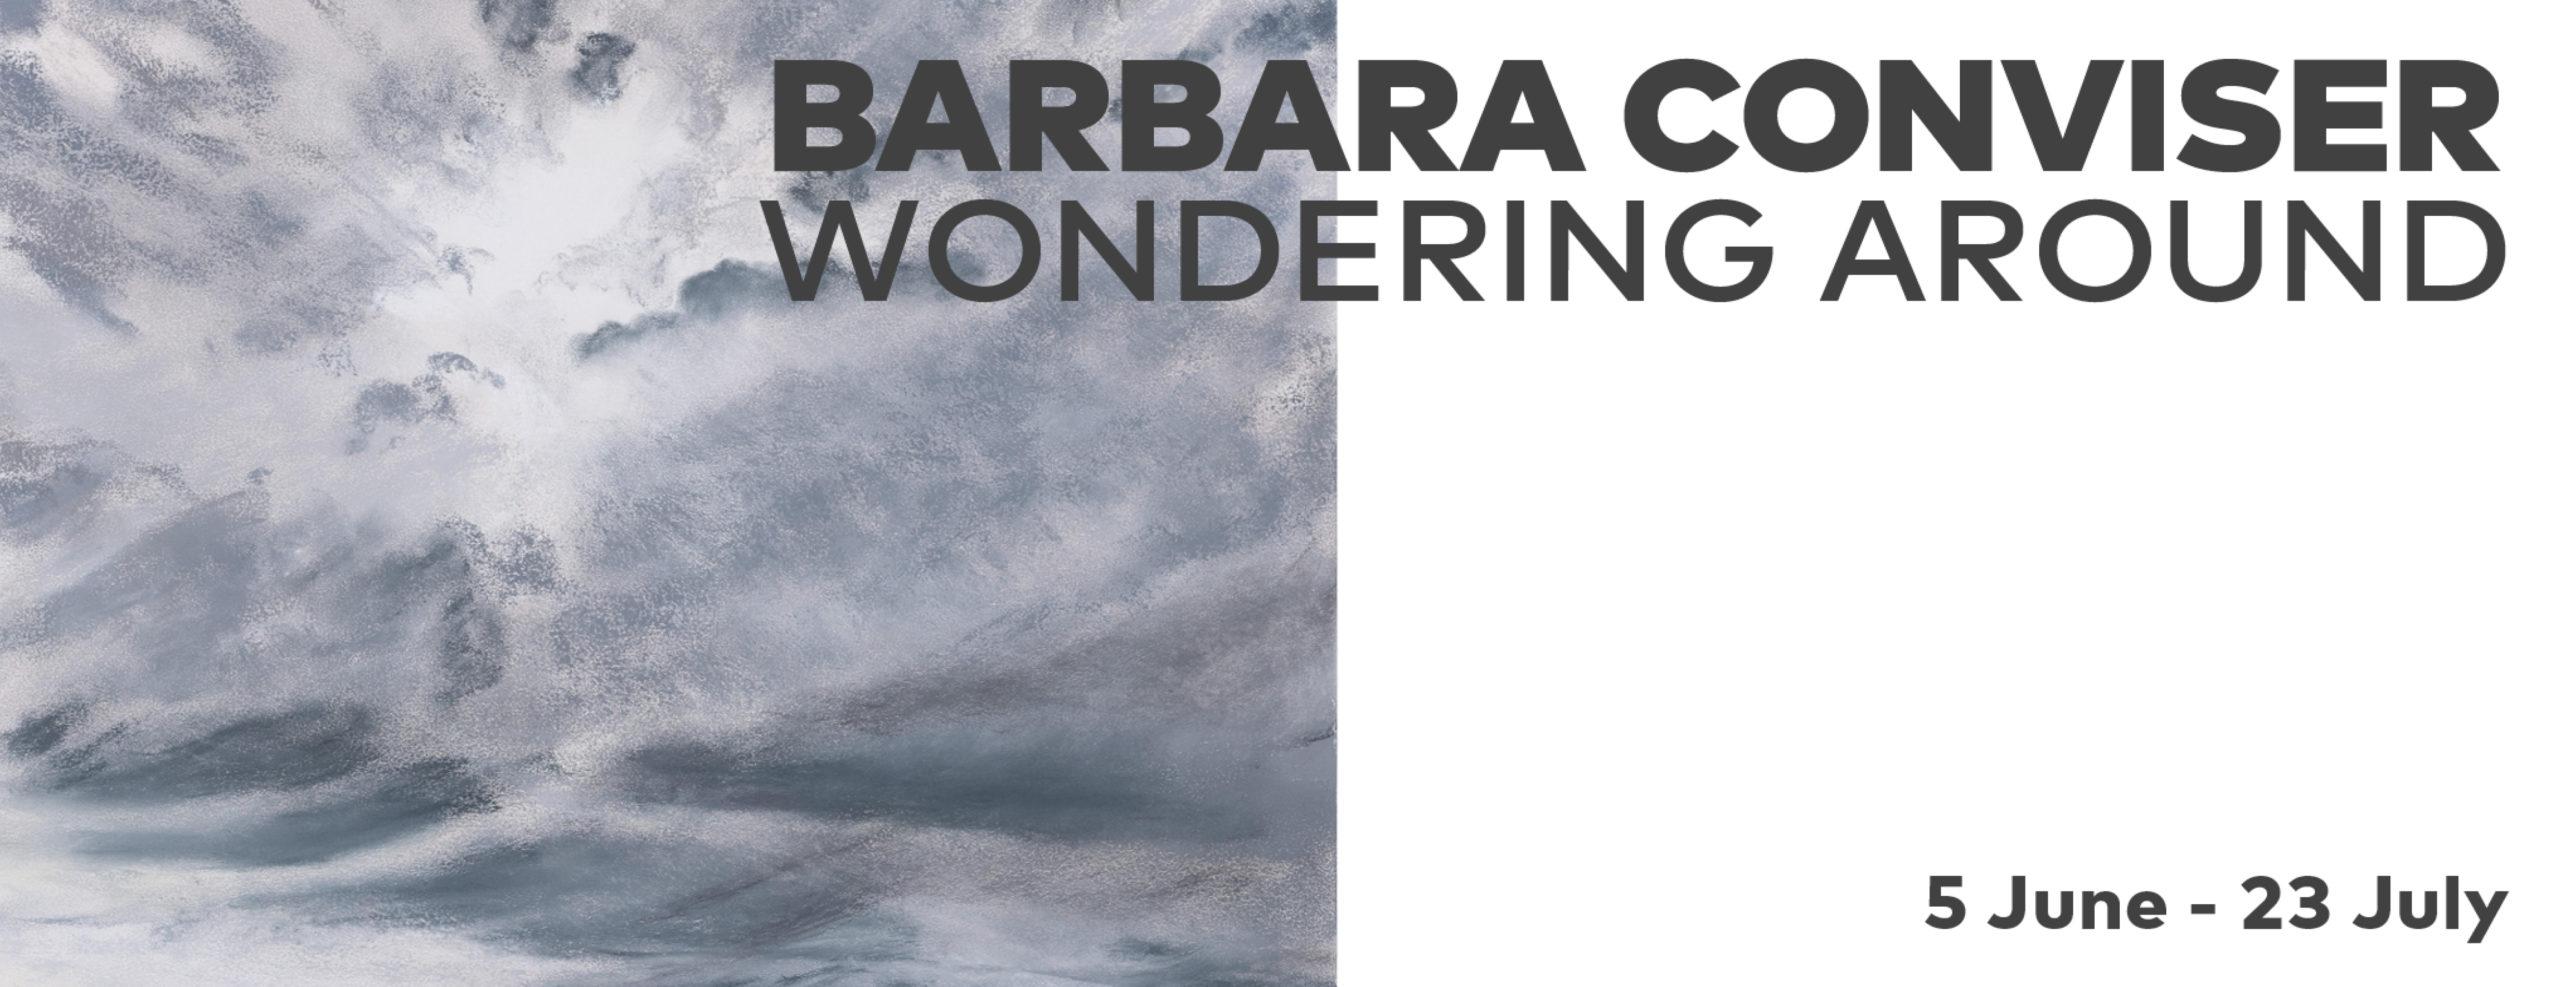 Barbara Conviser Slide